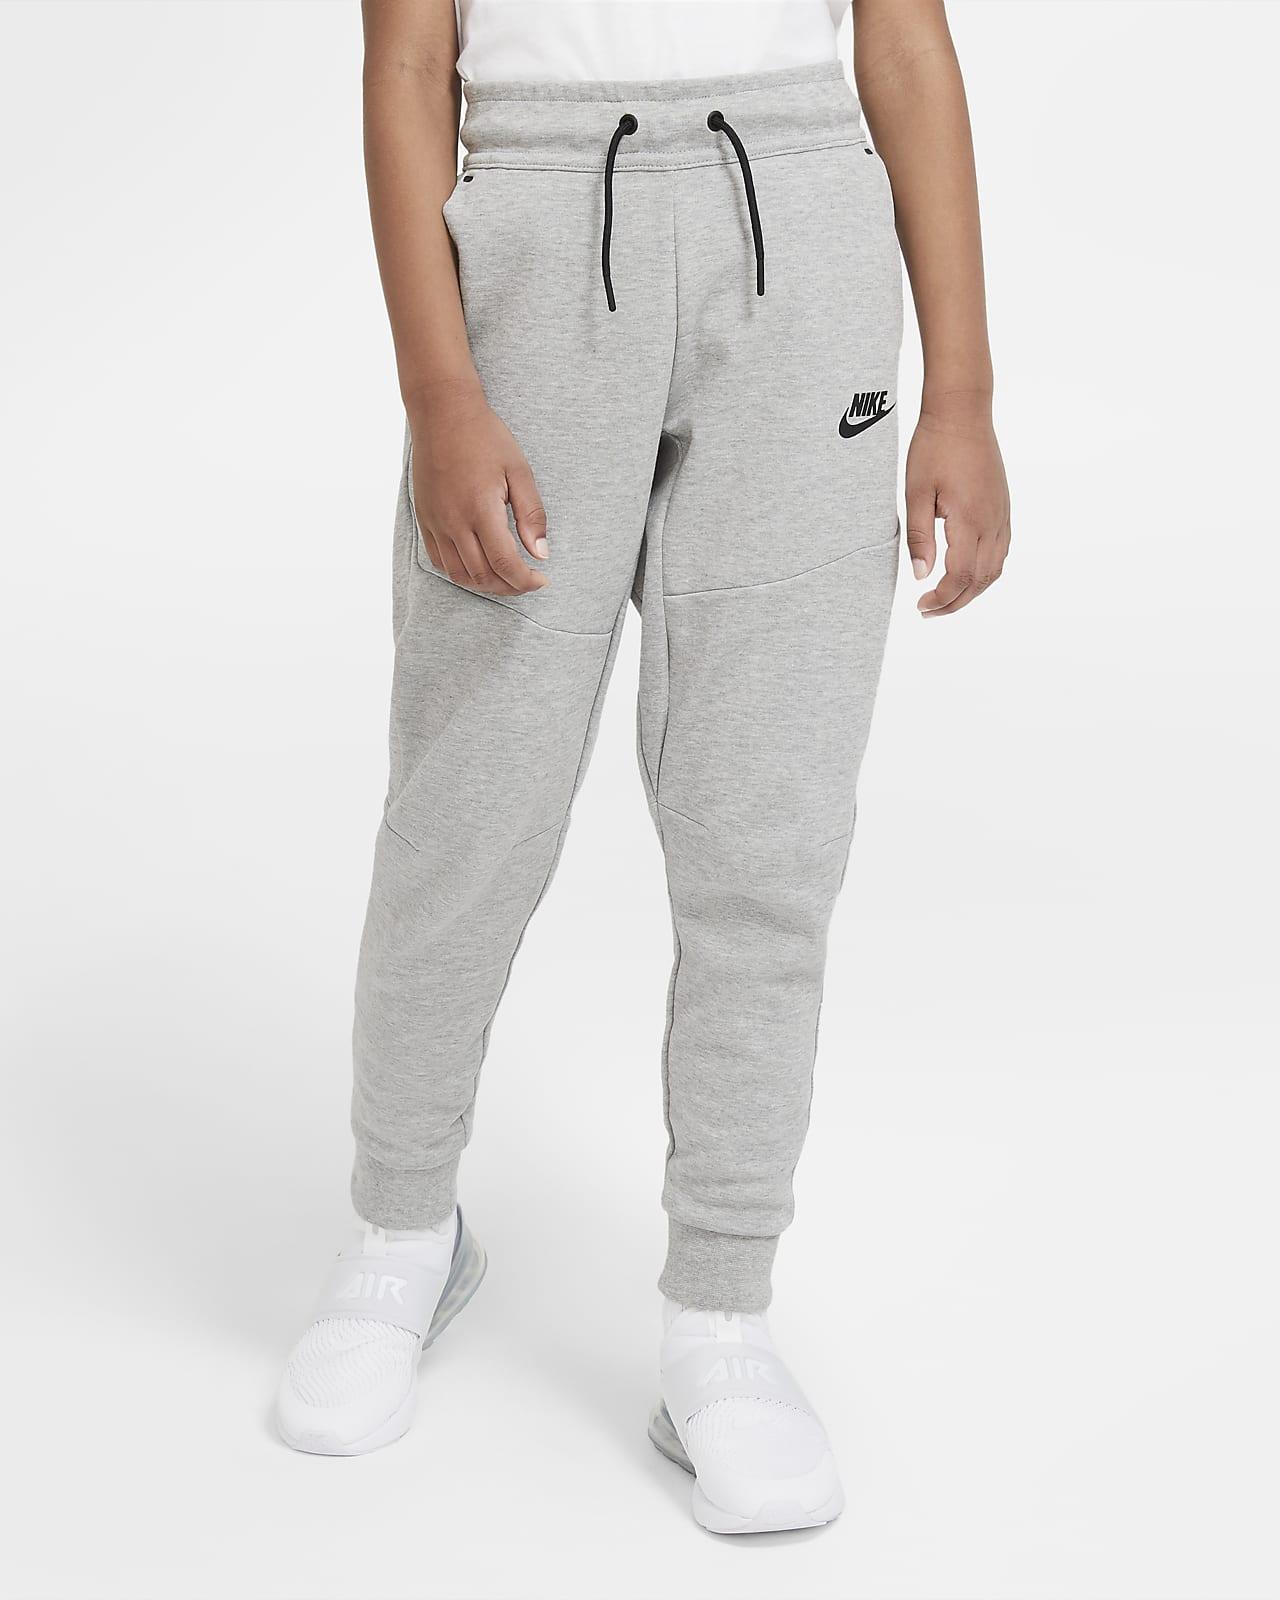 Byxor Nike Sportswear Tech Fleece för ungdom (killar)